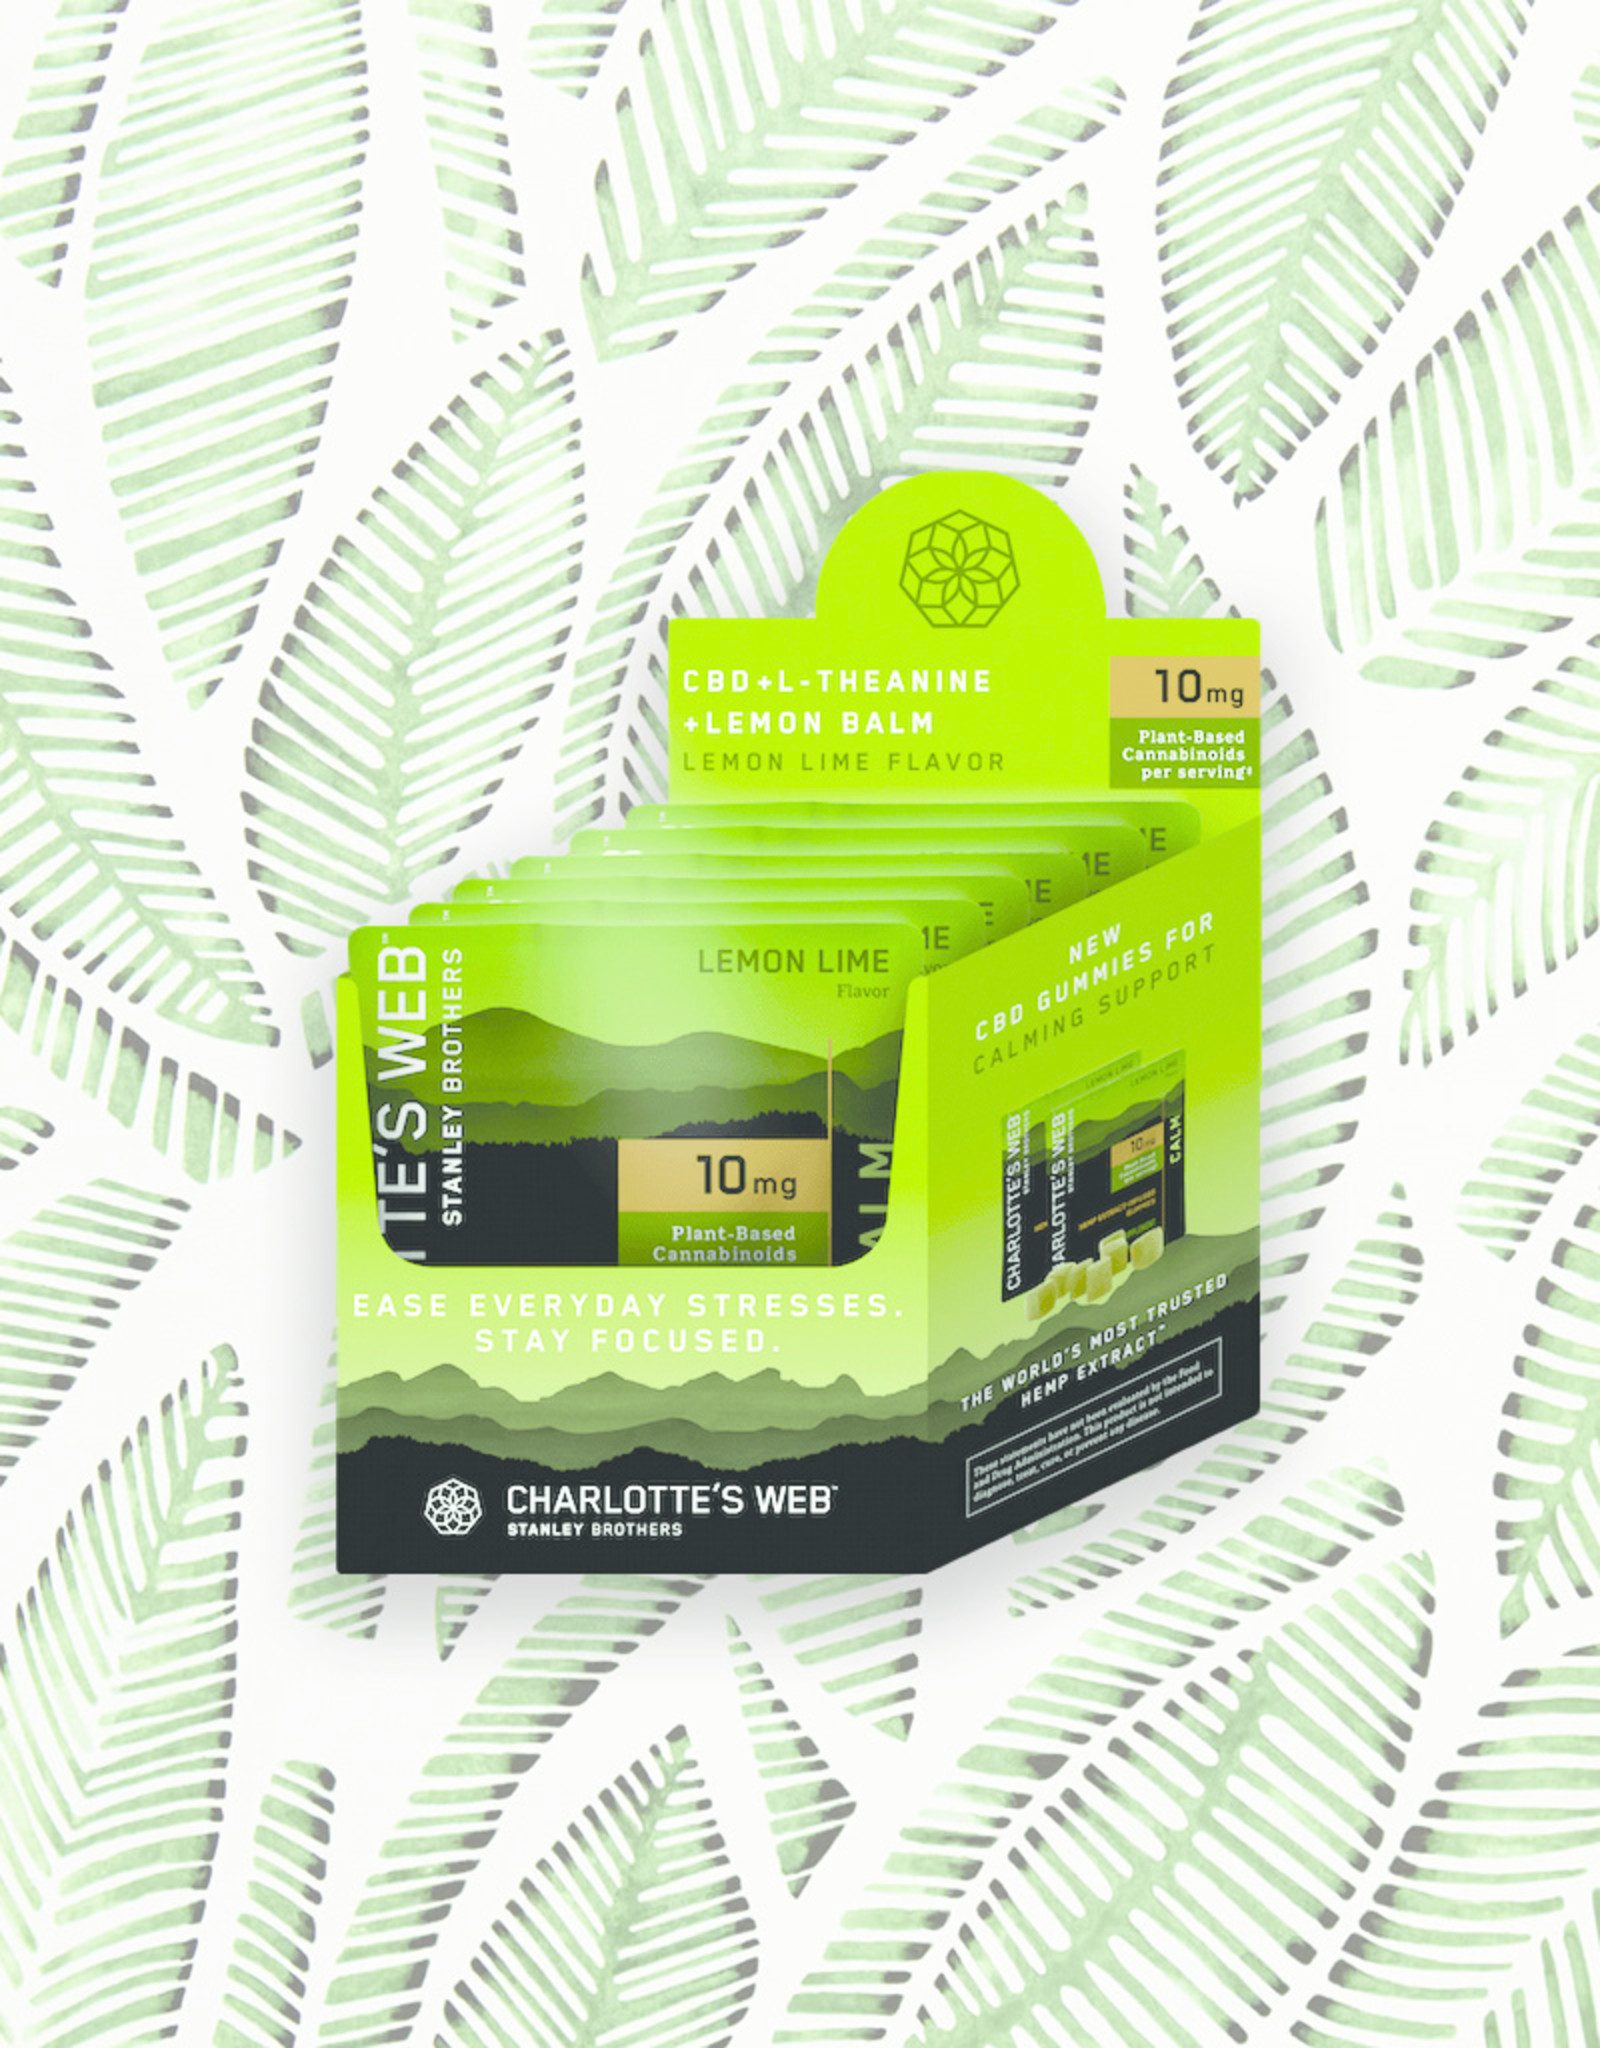 Charlotte's Web Charlotte's Web Hemp Gummies Lemon Lime 6 Count Packets